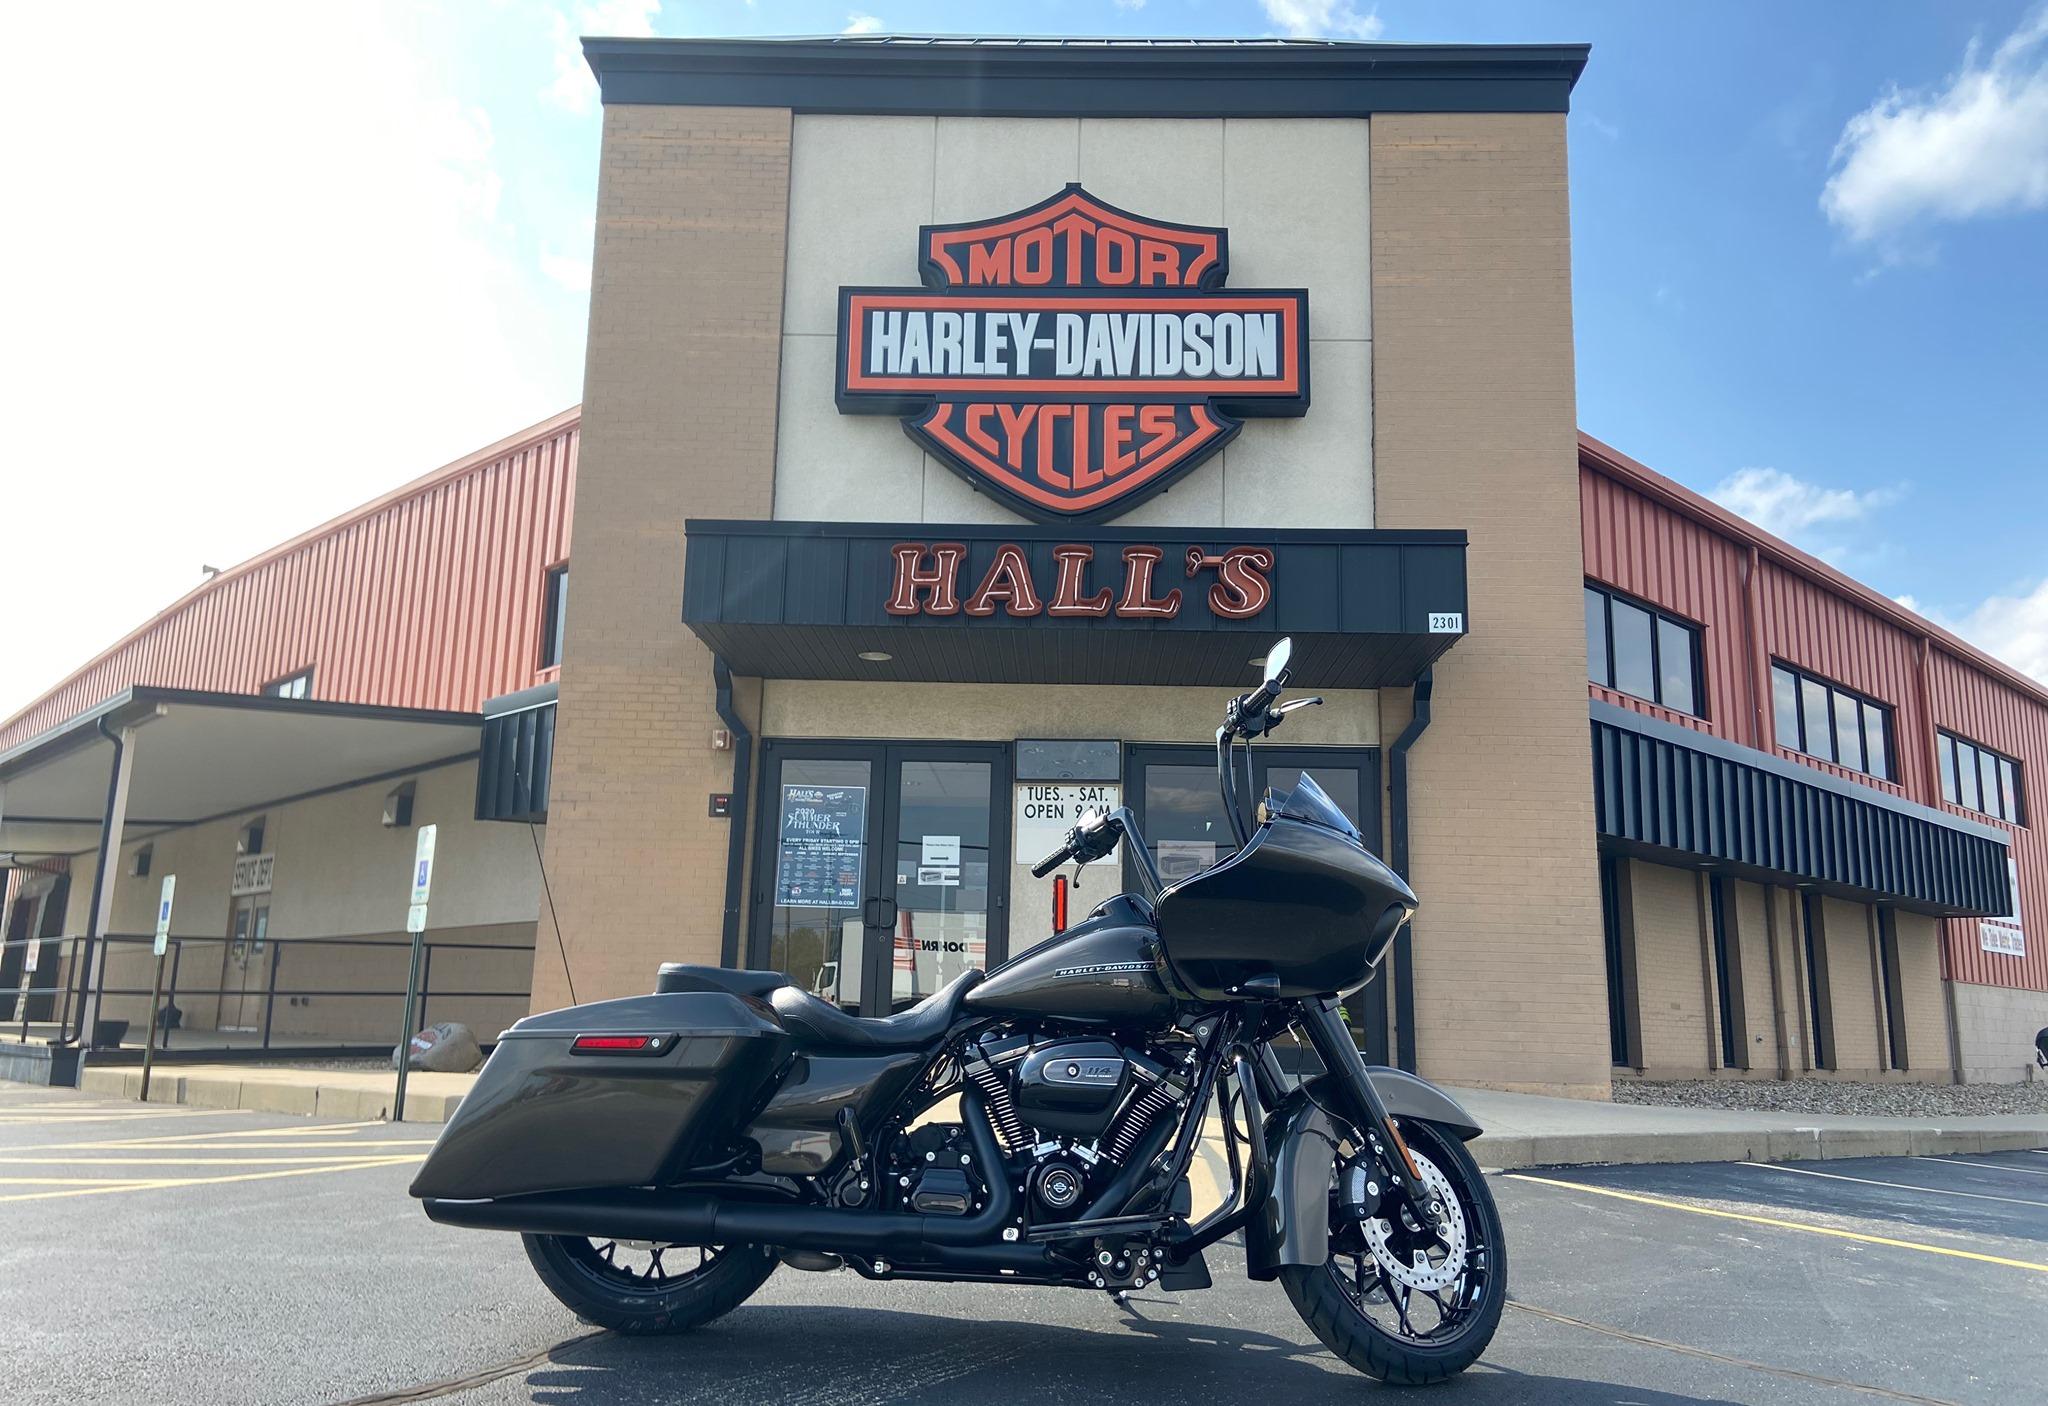 Hall's Harley Davidson